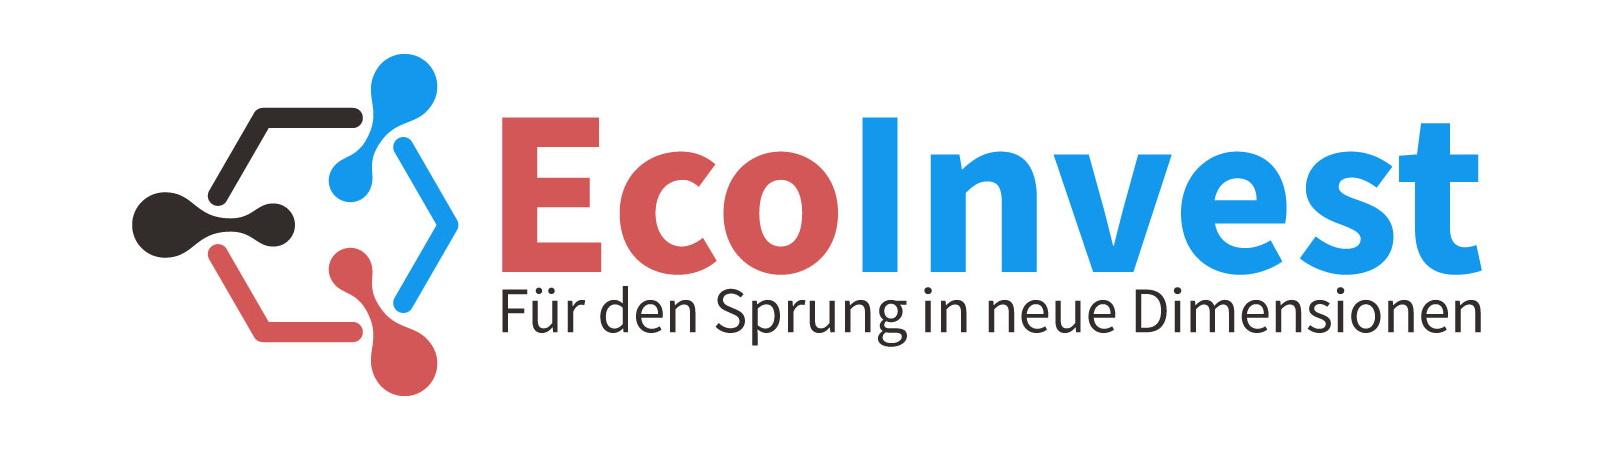 Log EcoInvest